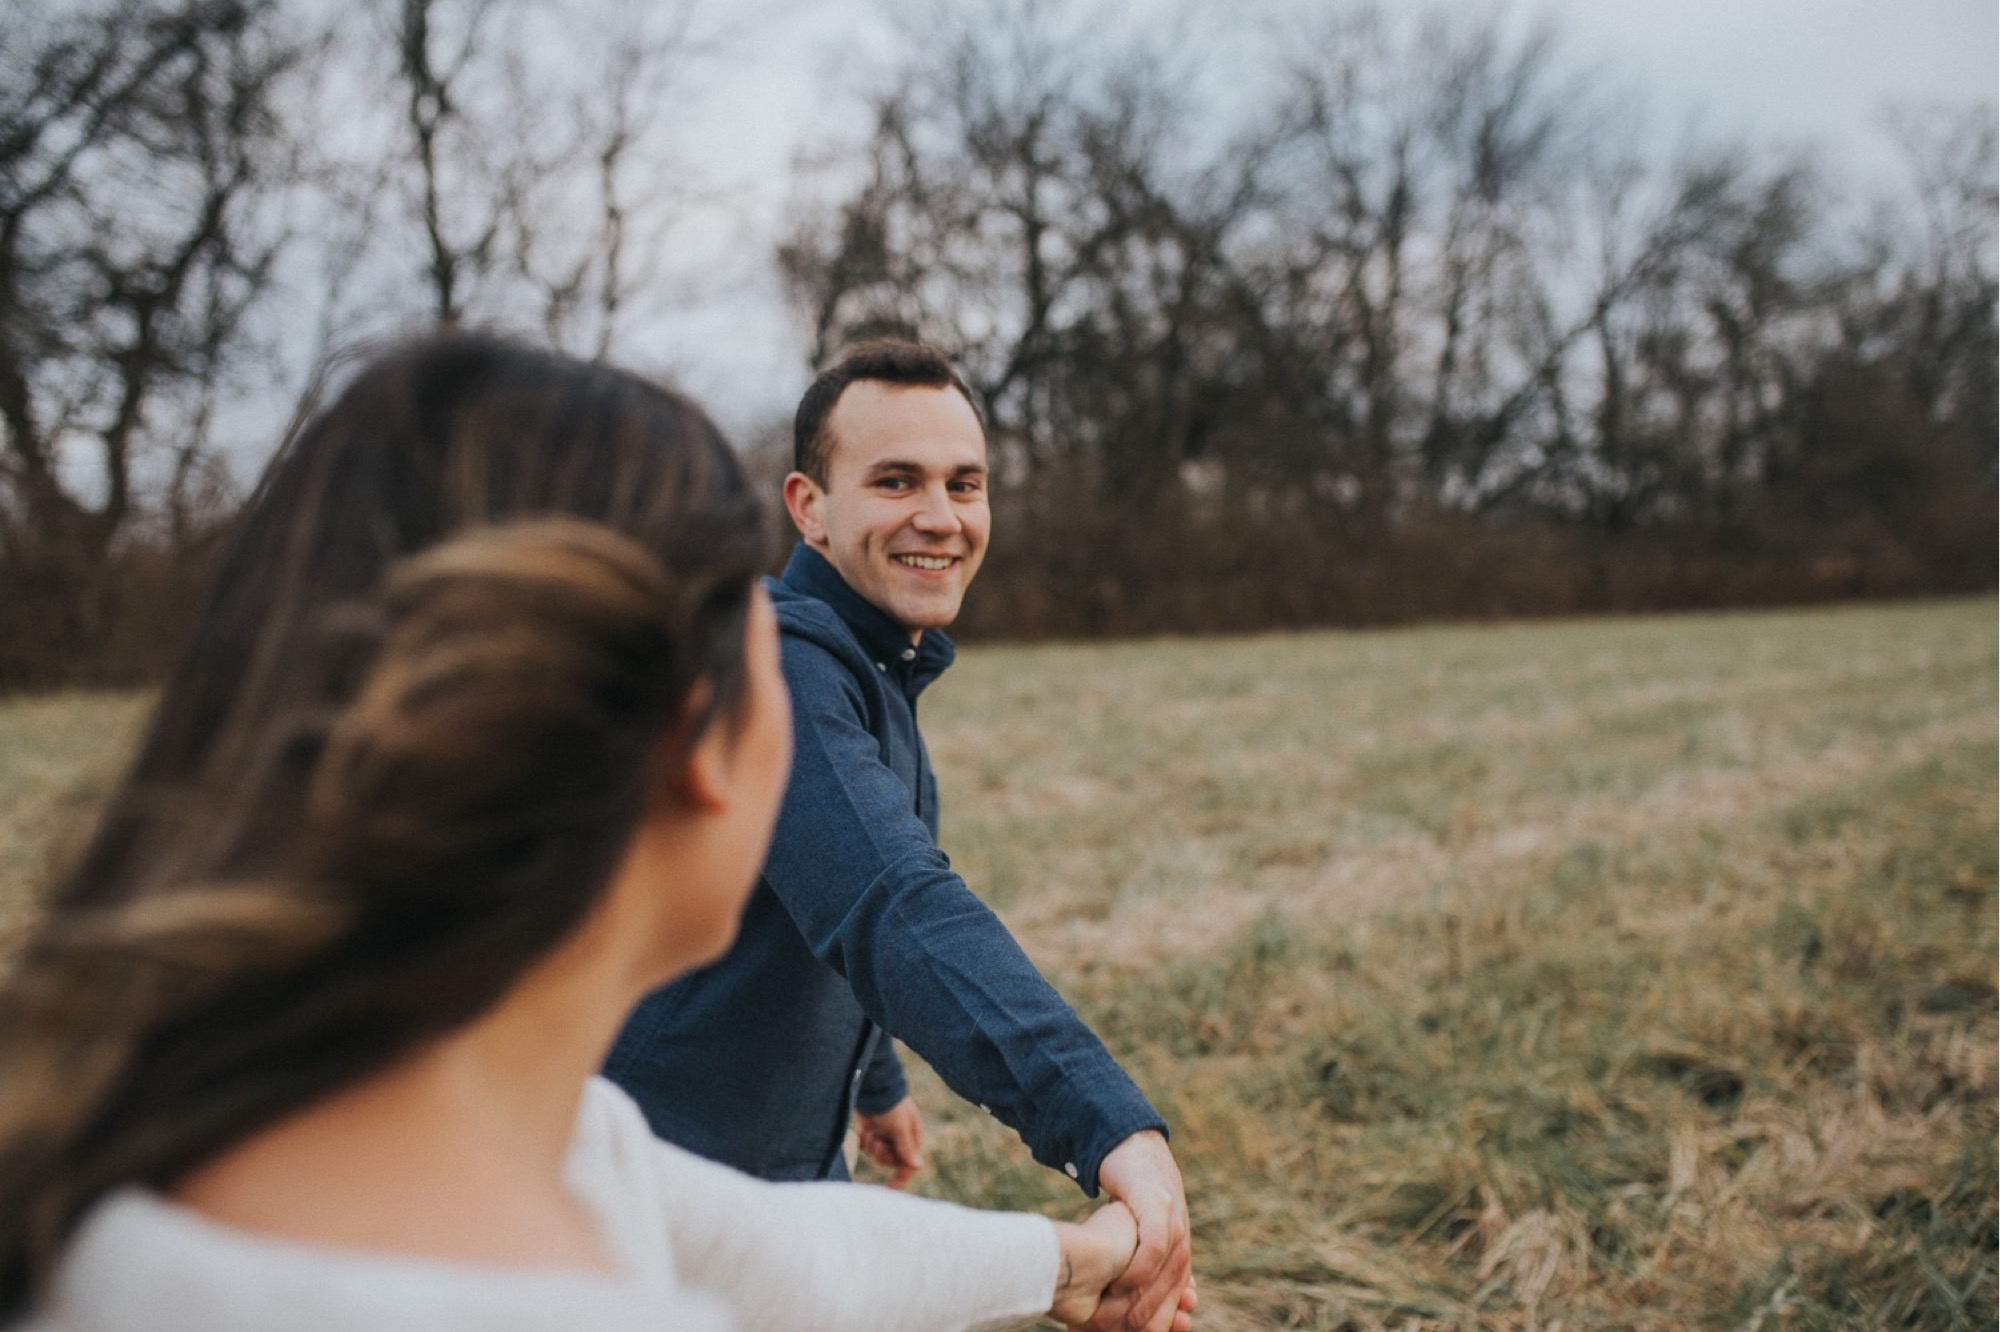 boyfriend having fun at their engagement session